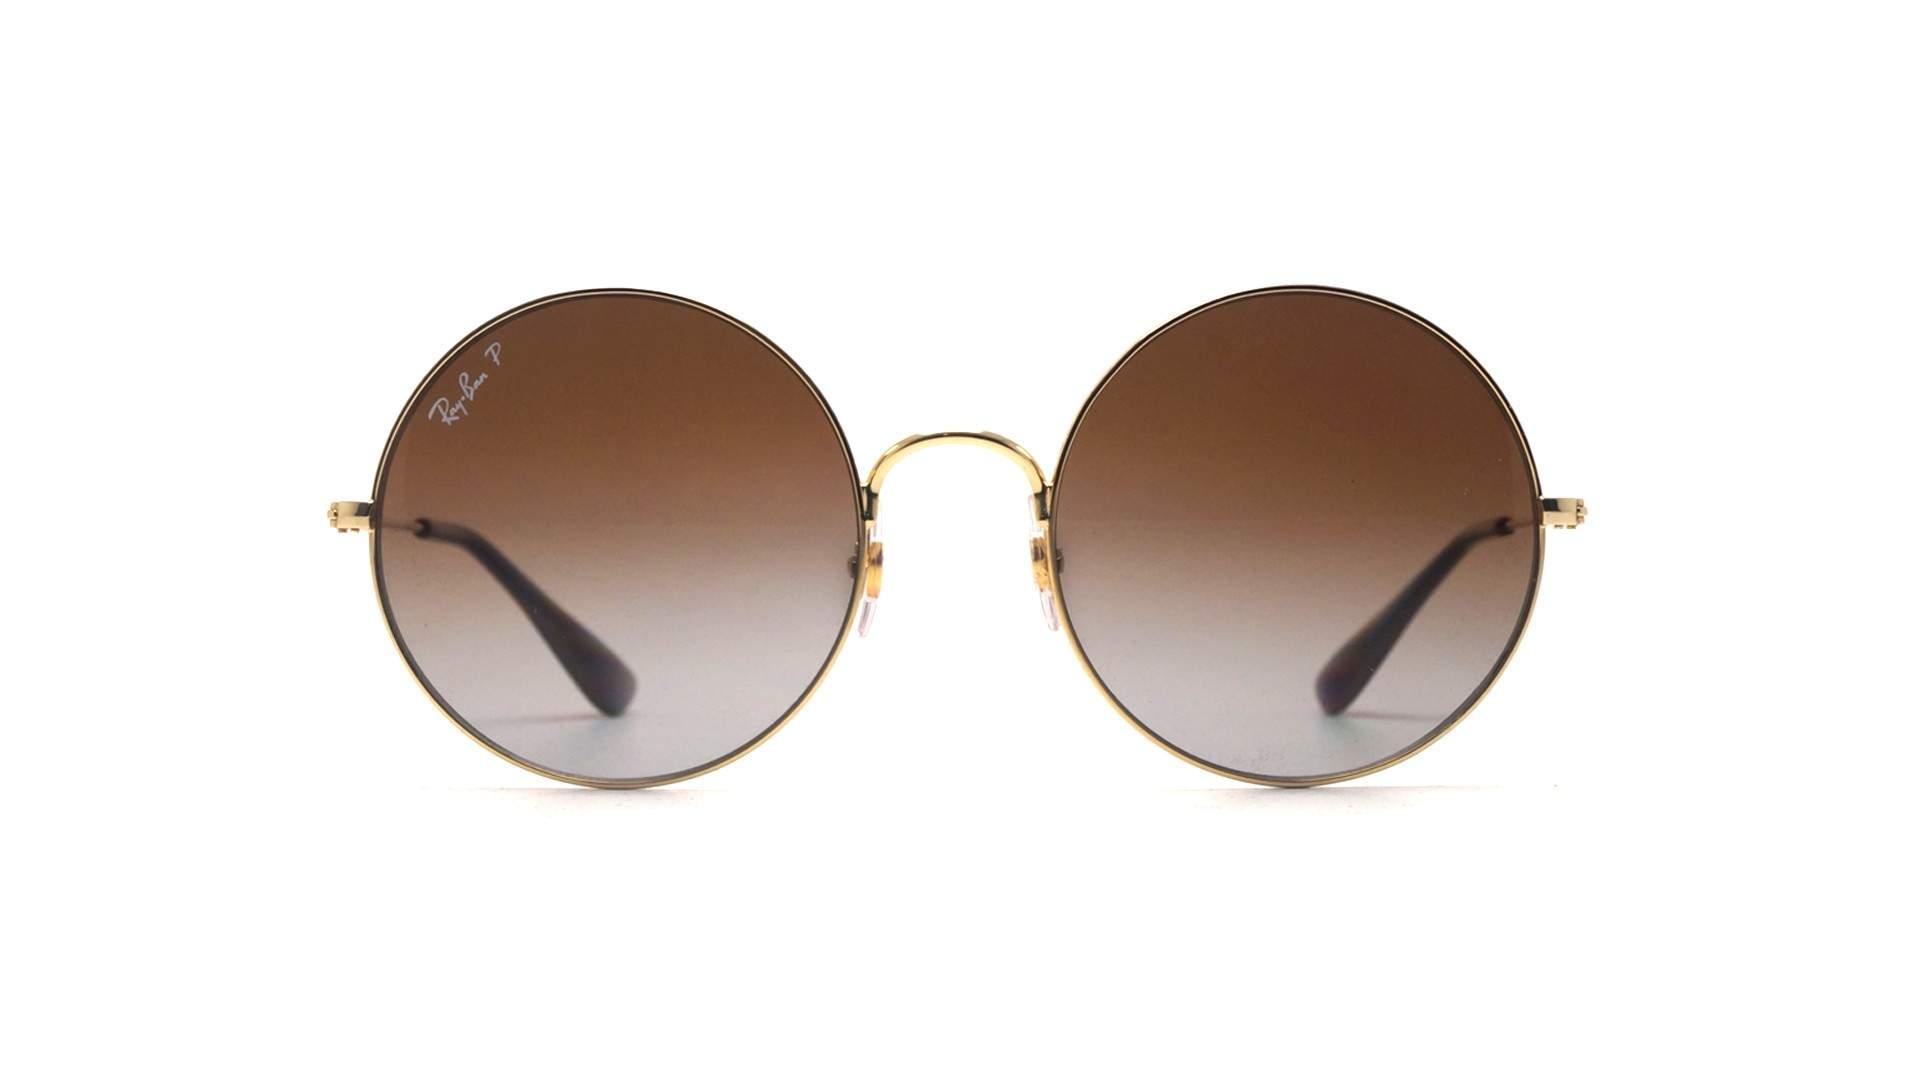 823558fd3 Sunglasses Ray-Ban Ja-jo Gold RB3592 001/T5 50-20 Medium Polarized Gradient